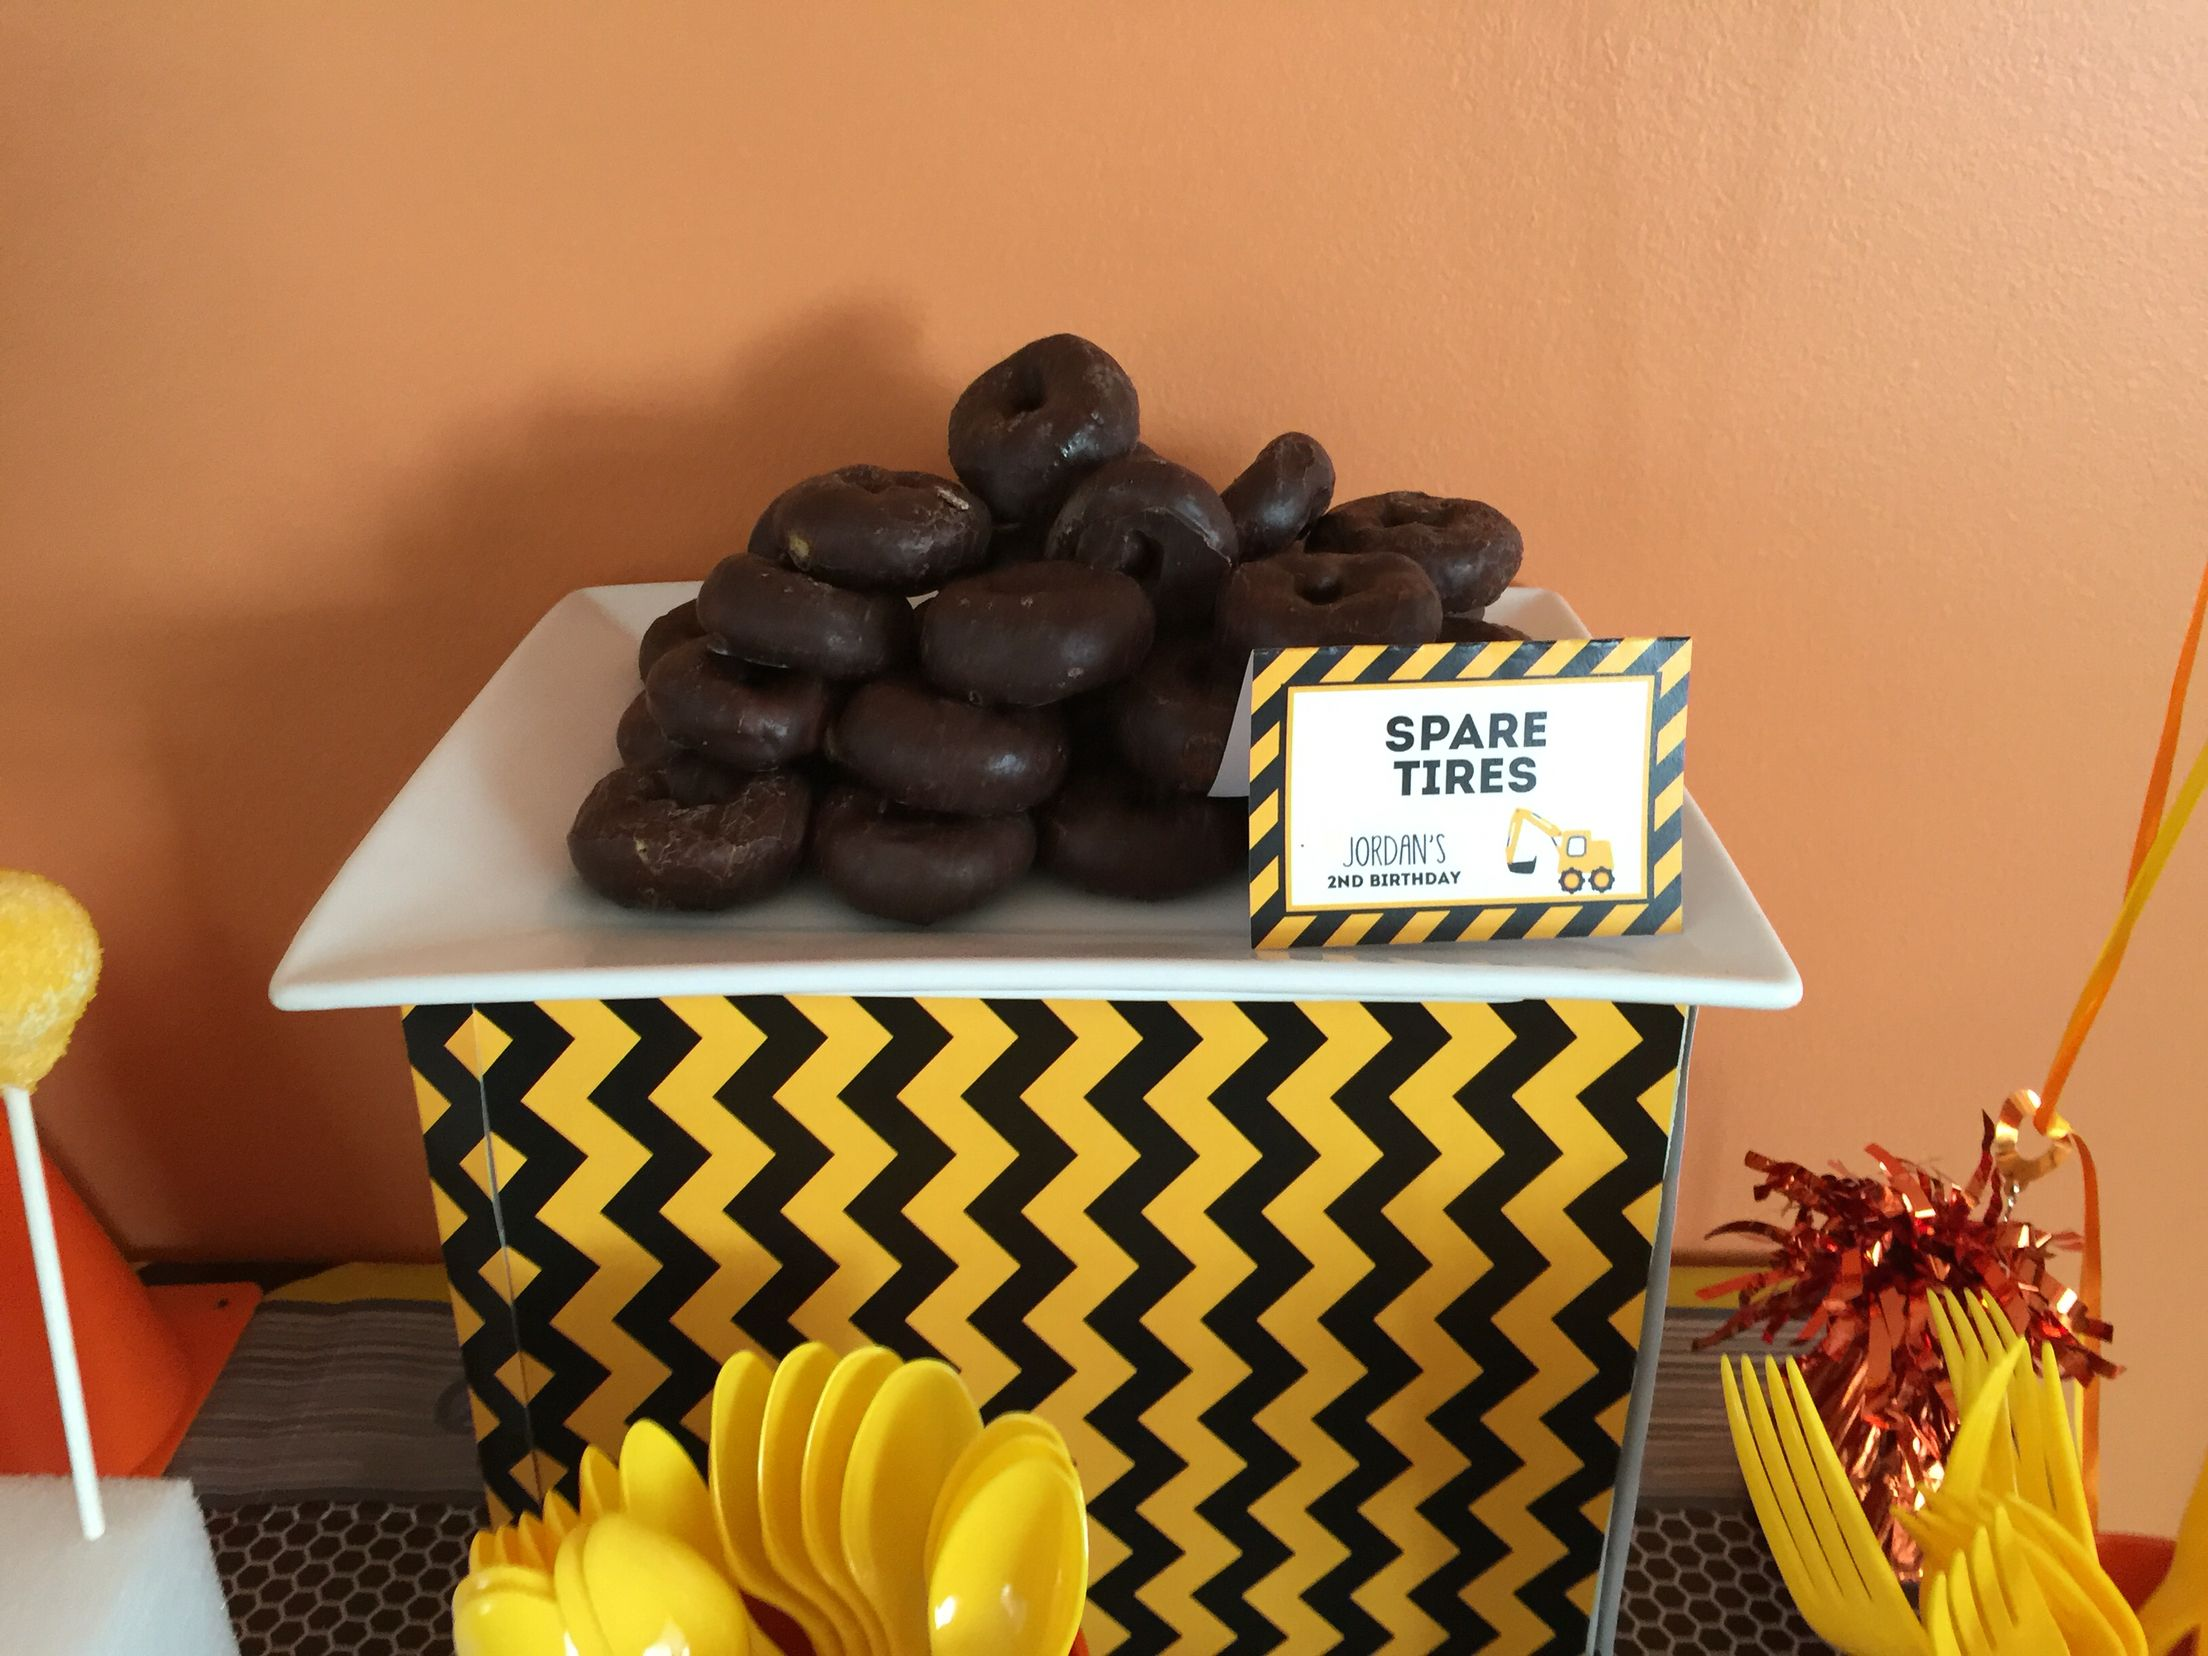 Construction Themed Birthday Party: Food Ideas